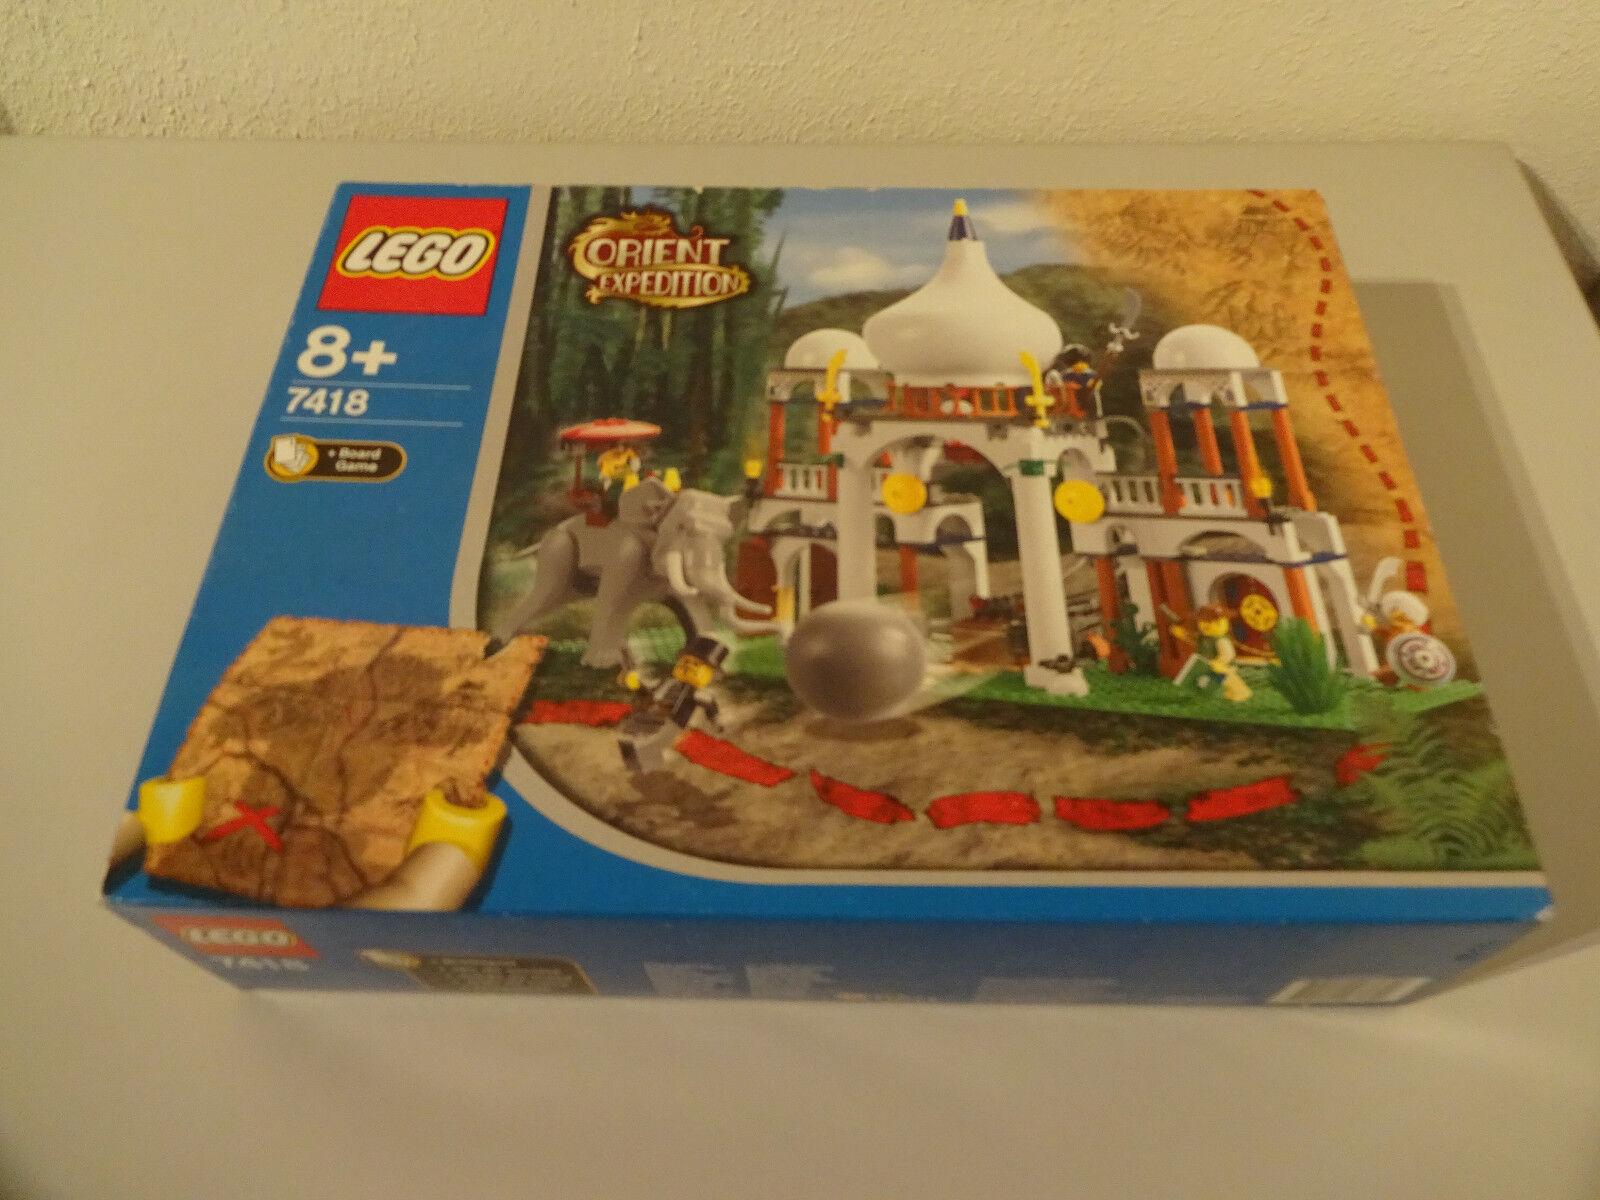 (TB) Lego 7418 7418 7418 Orient expedition Scorpion Palais Nouveau orginalversiegelt d3b631